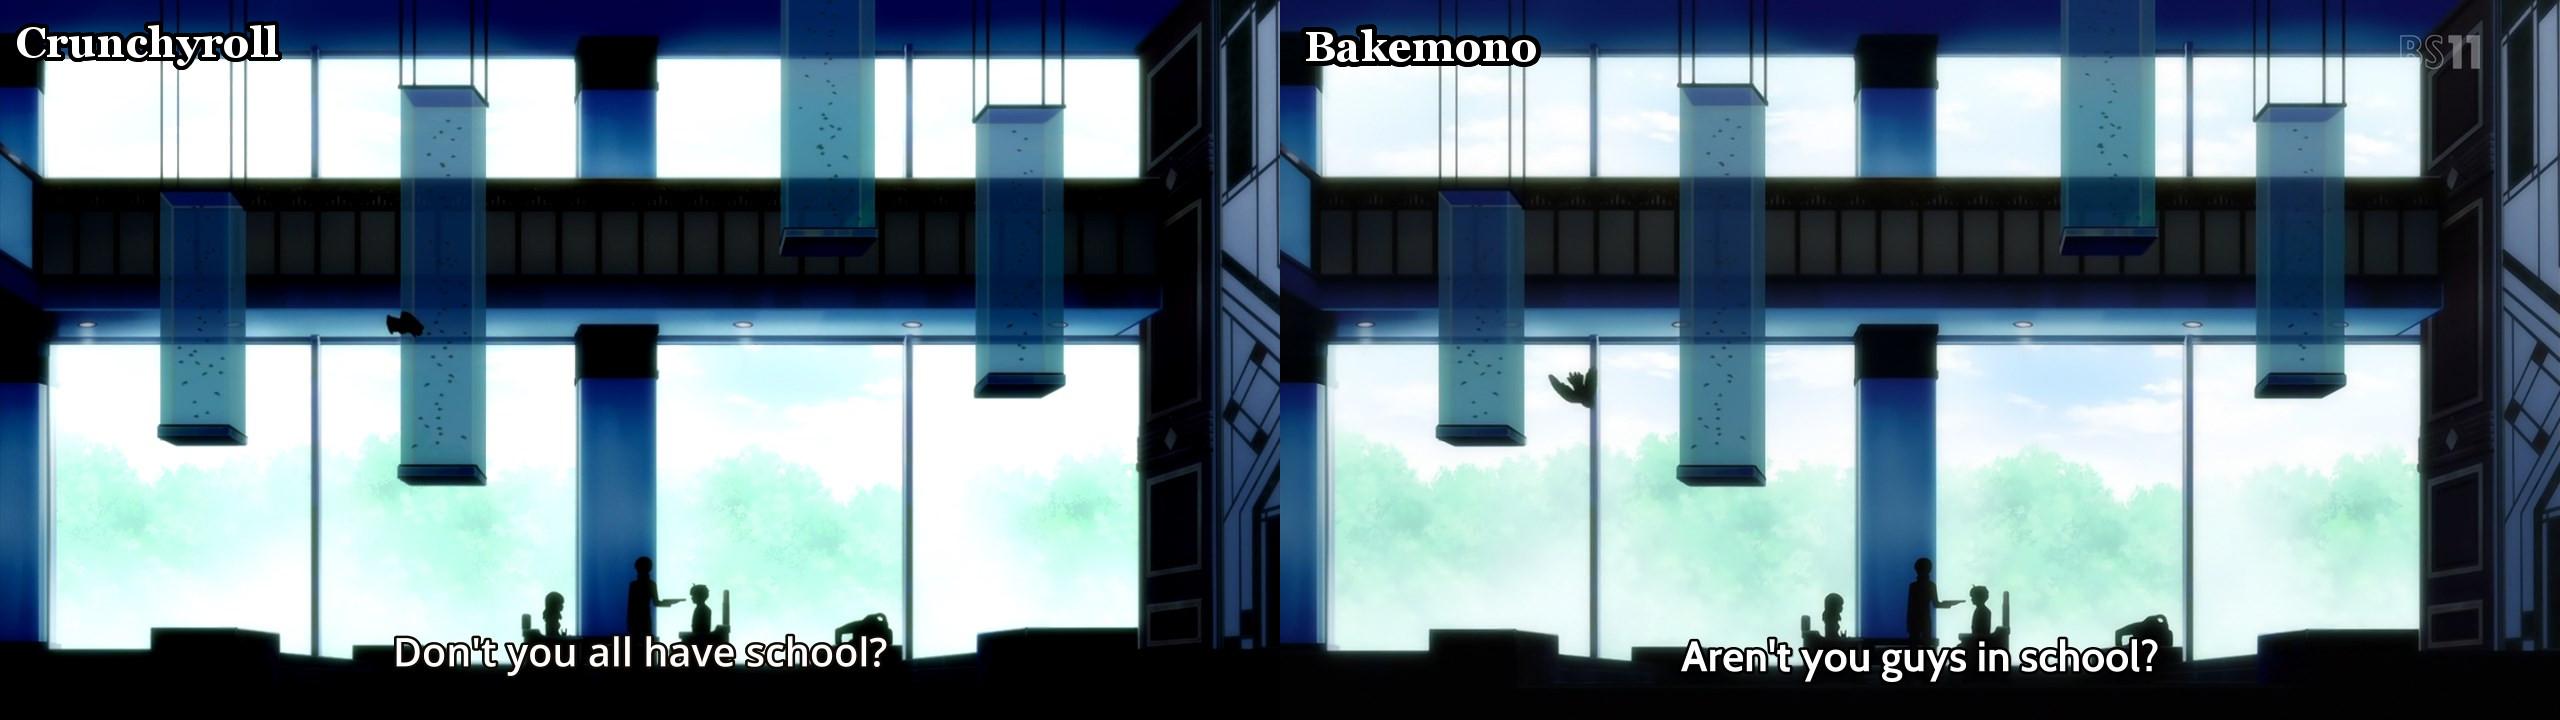 crunchyroll_versus_bakemono_-_trickster_-_99za